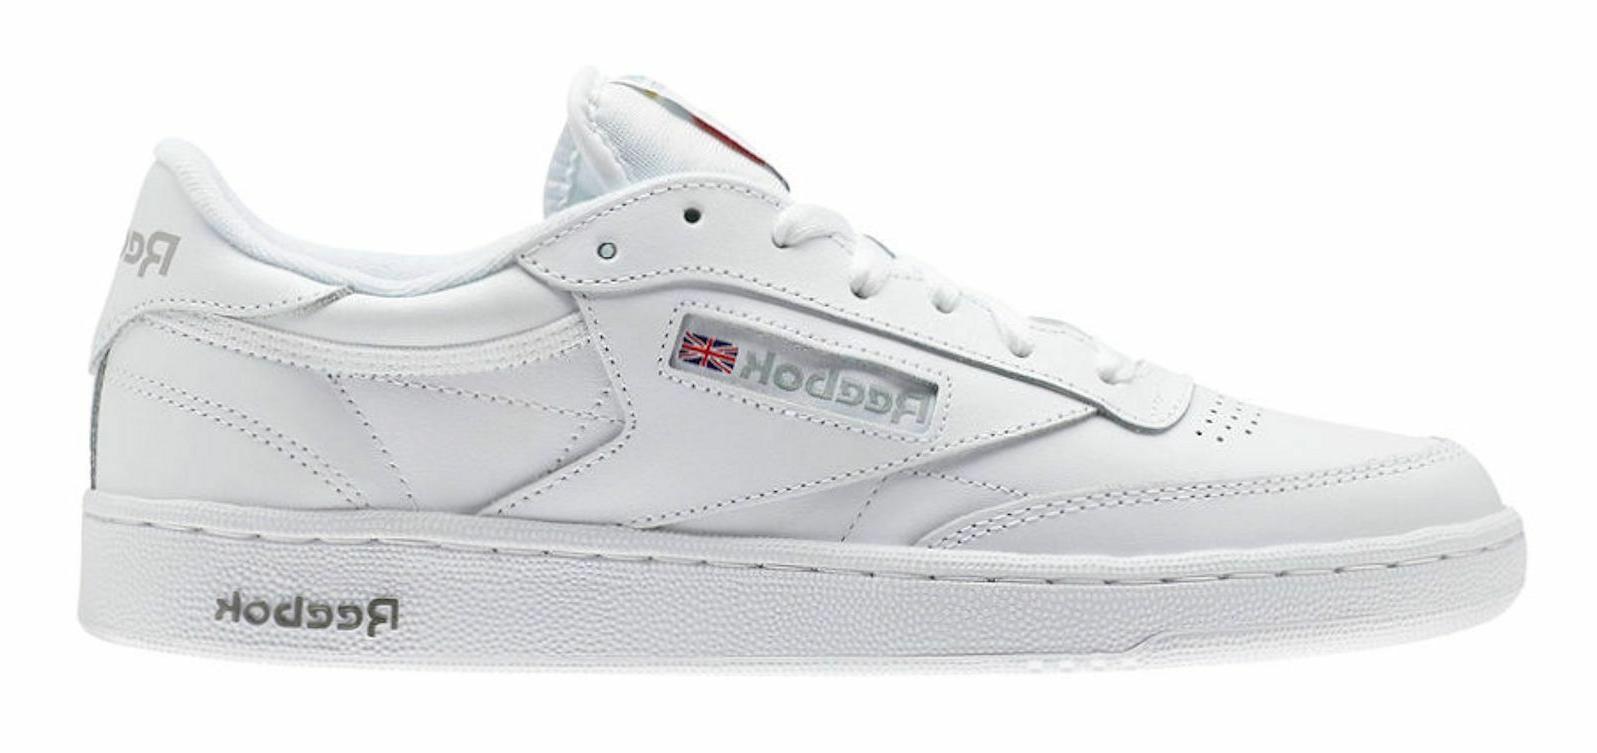 Reebok Classic 85 Mens Sneakers Tennis Item AR0455